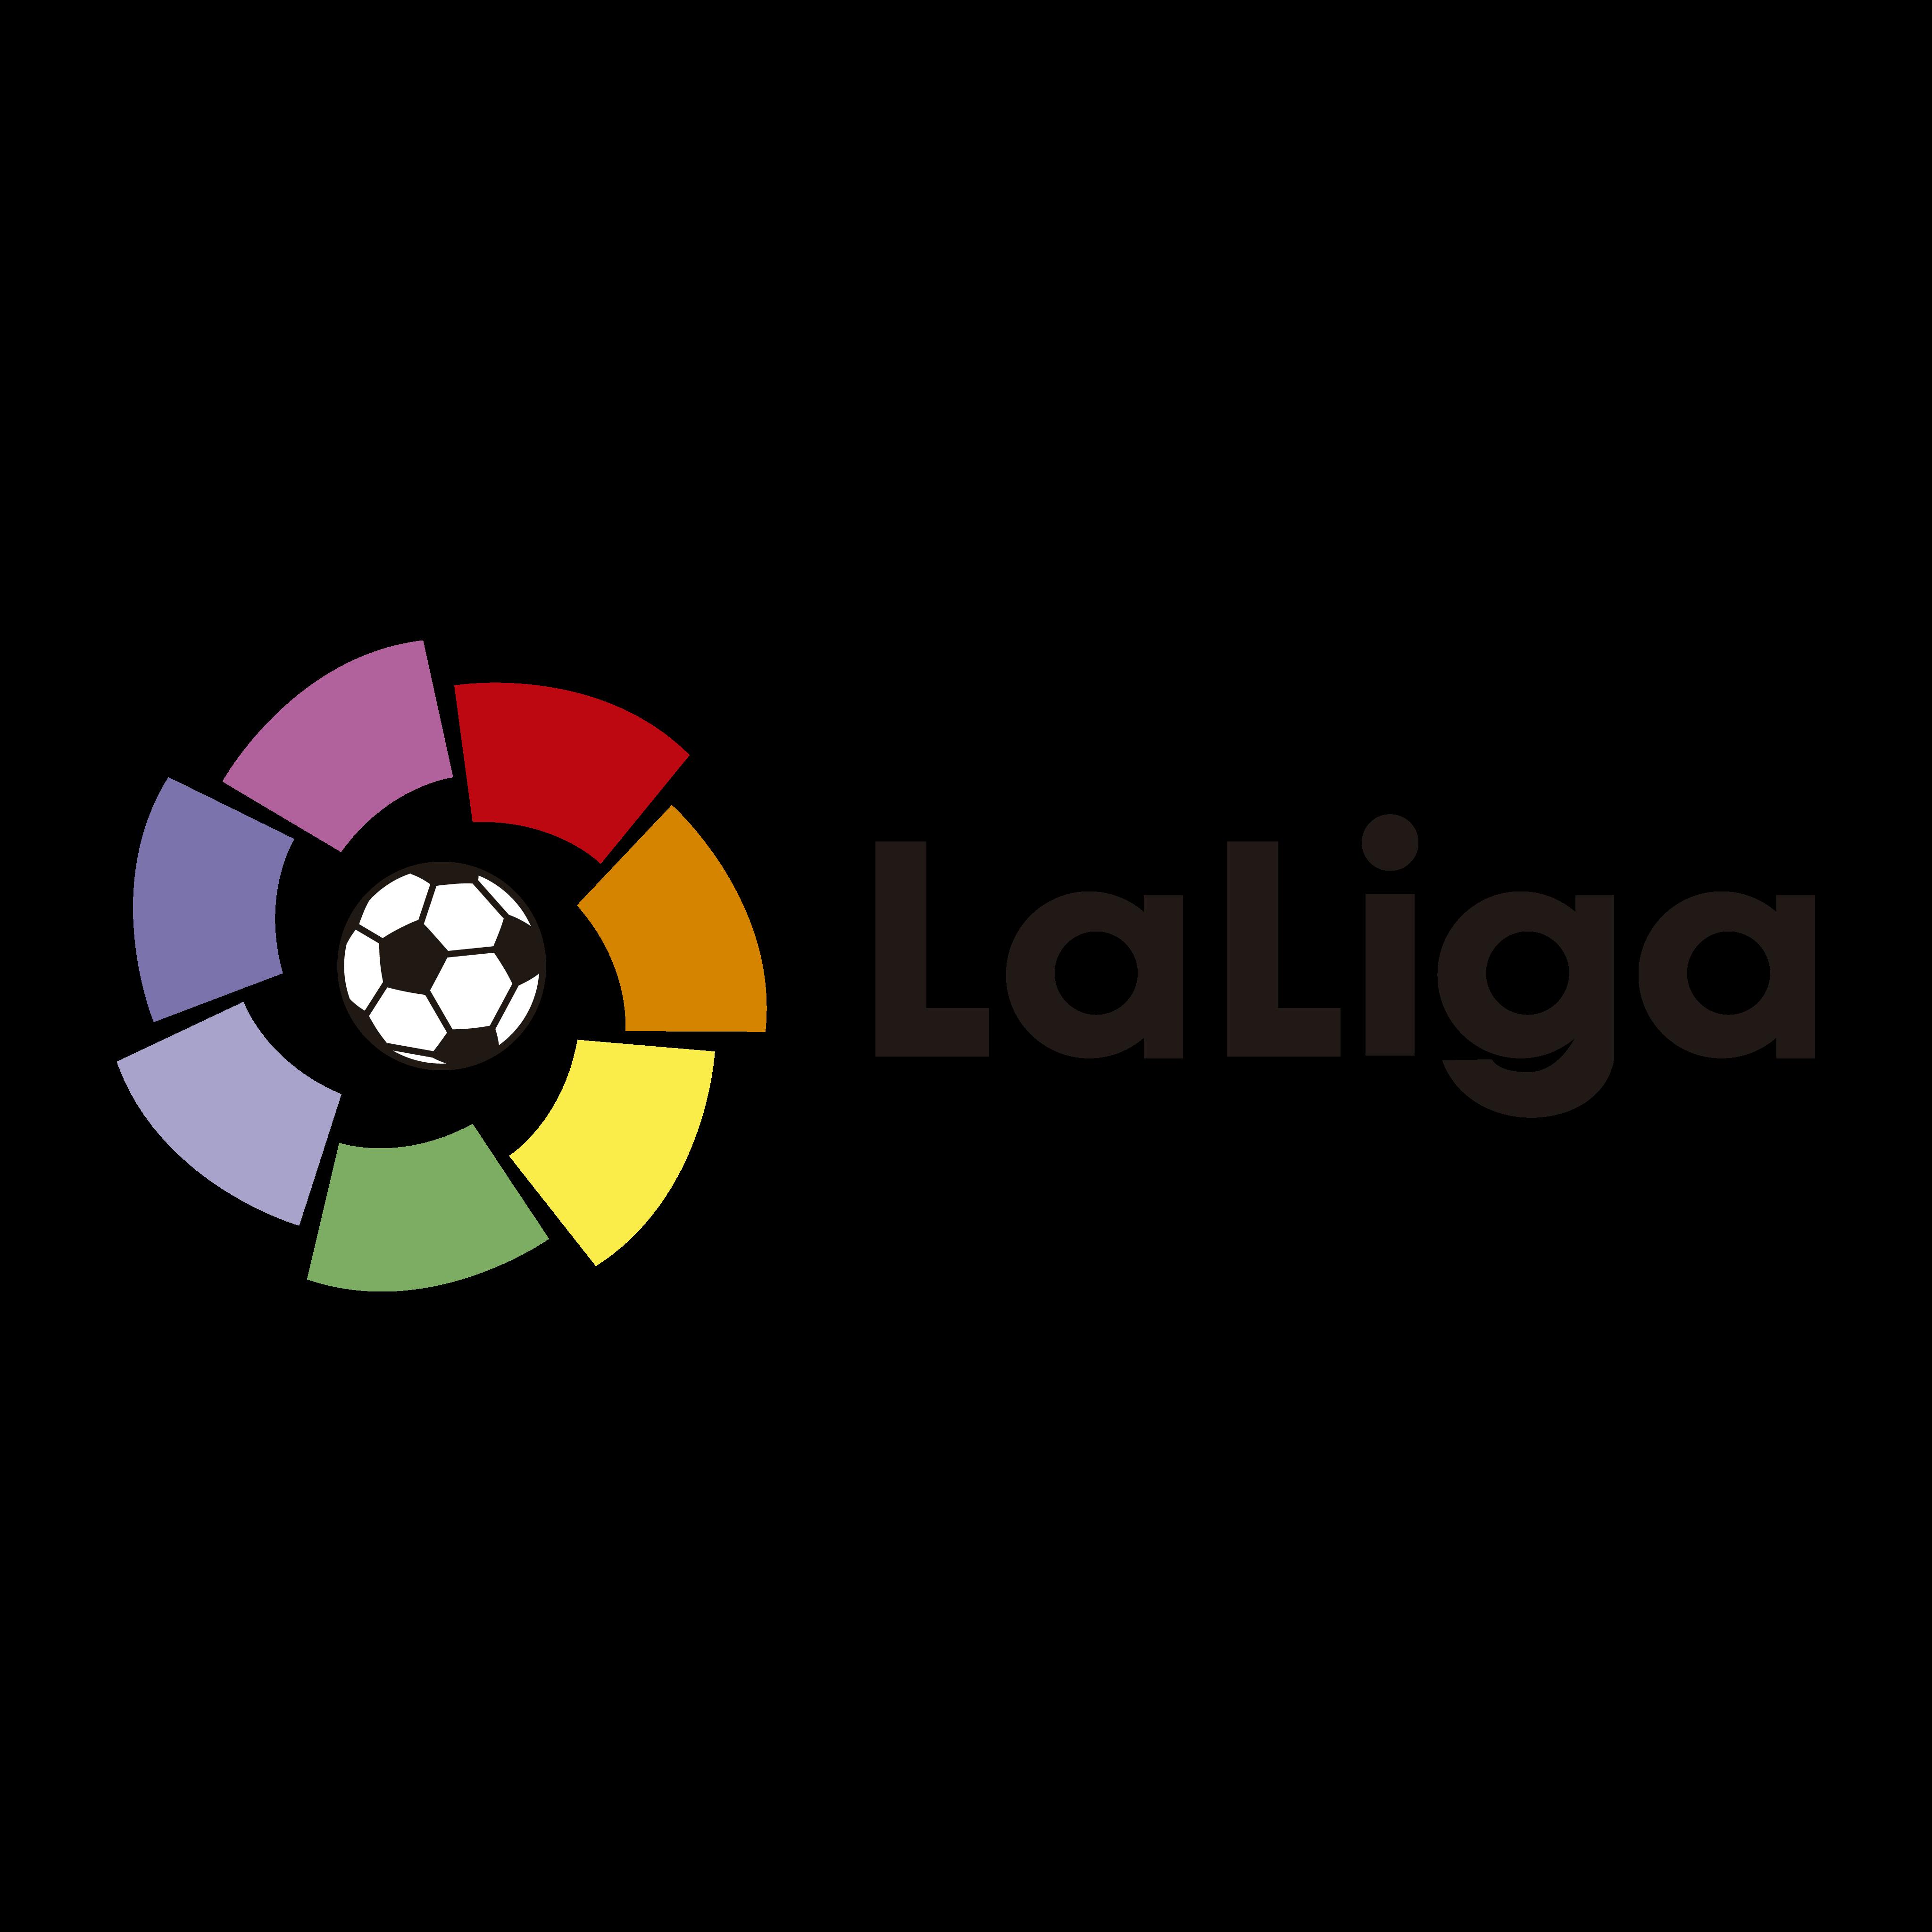 La Loga